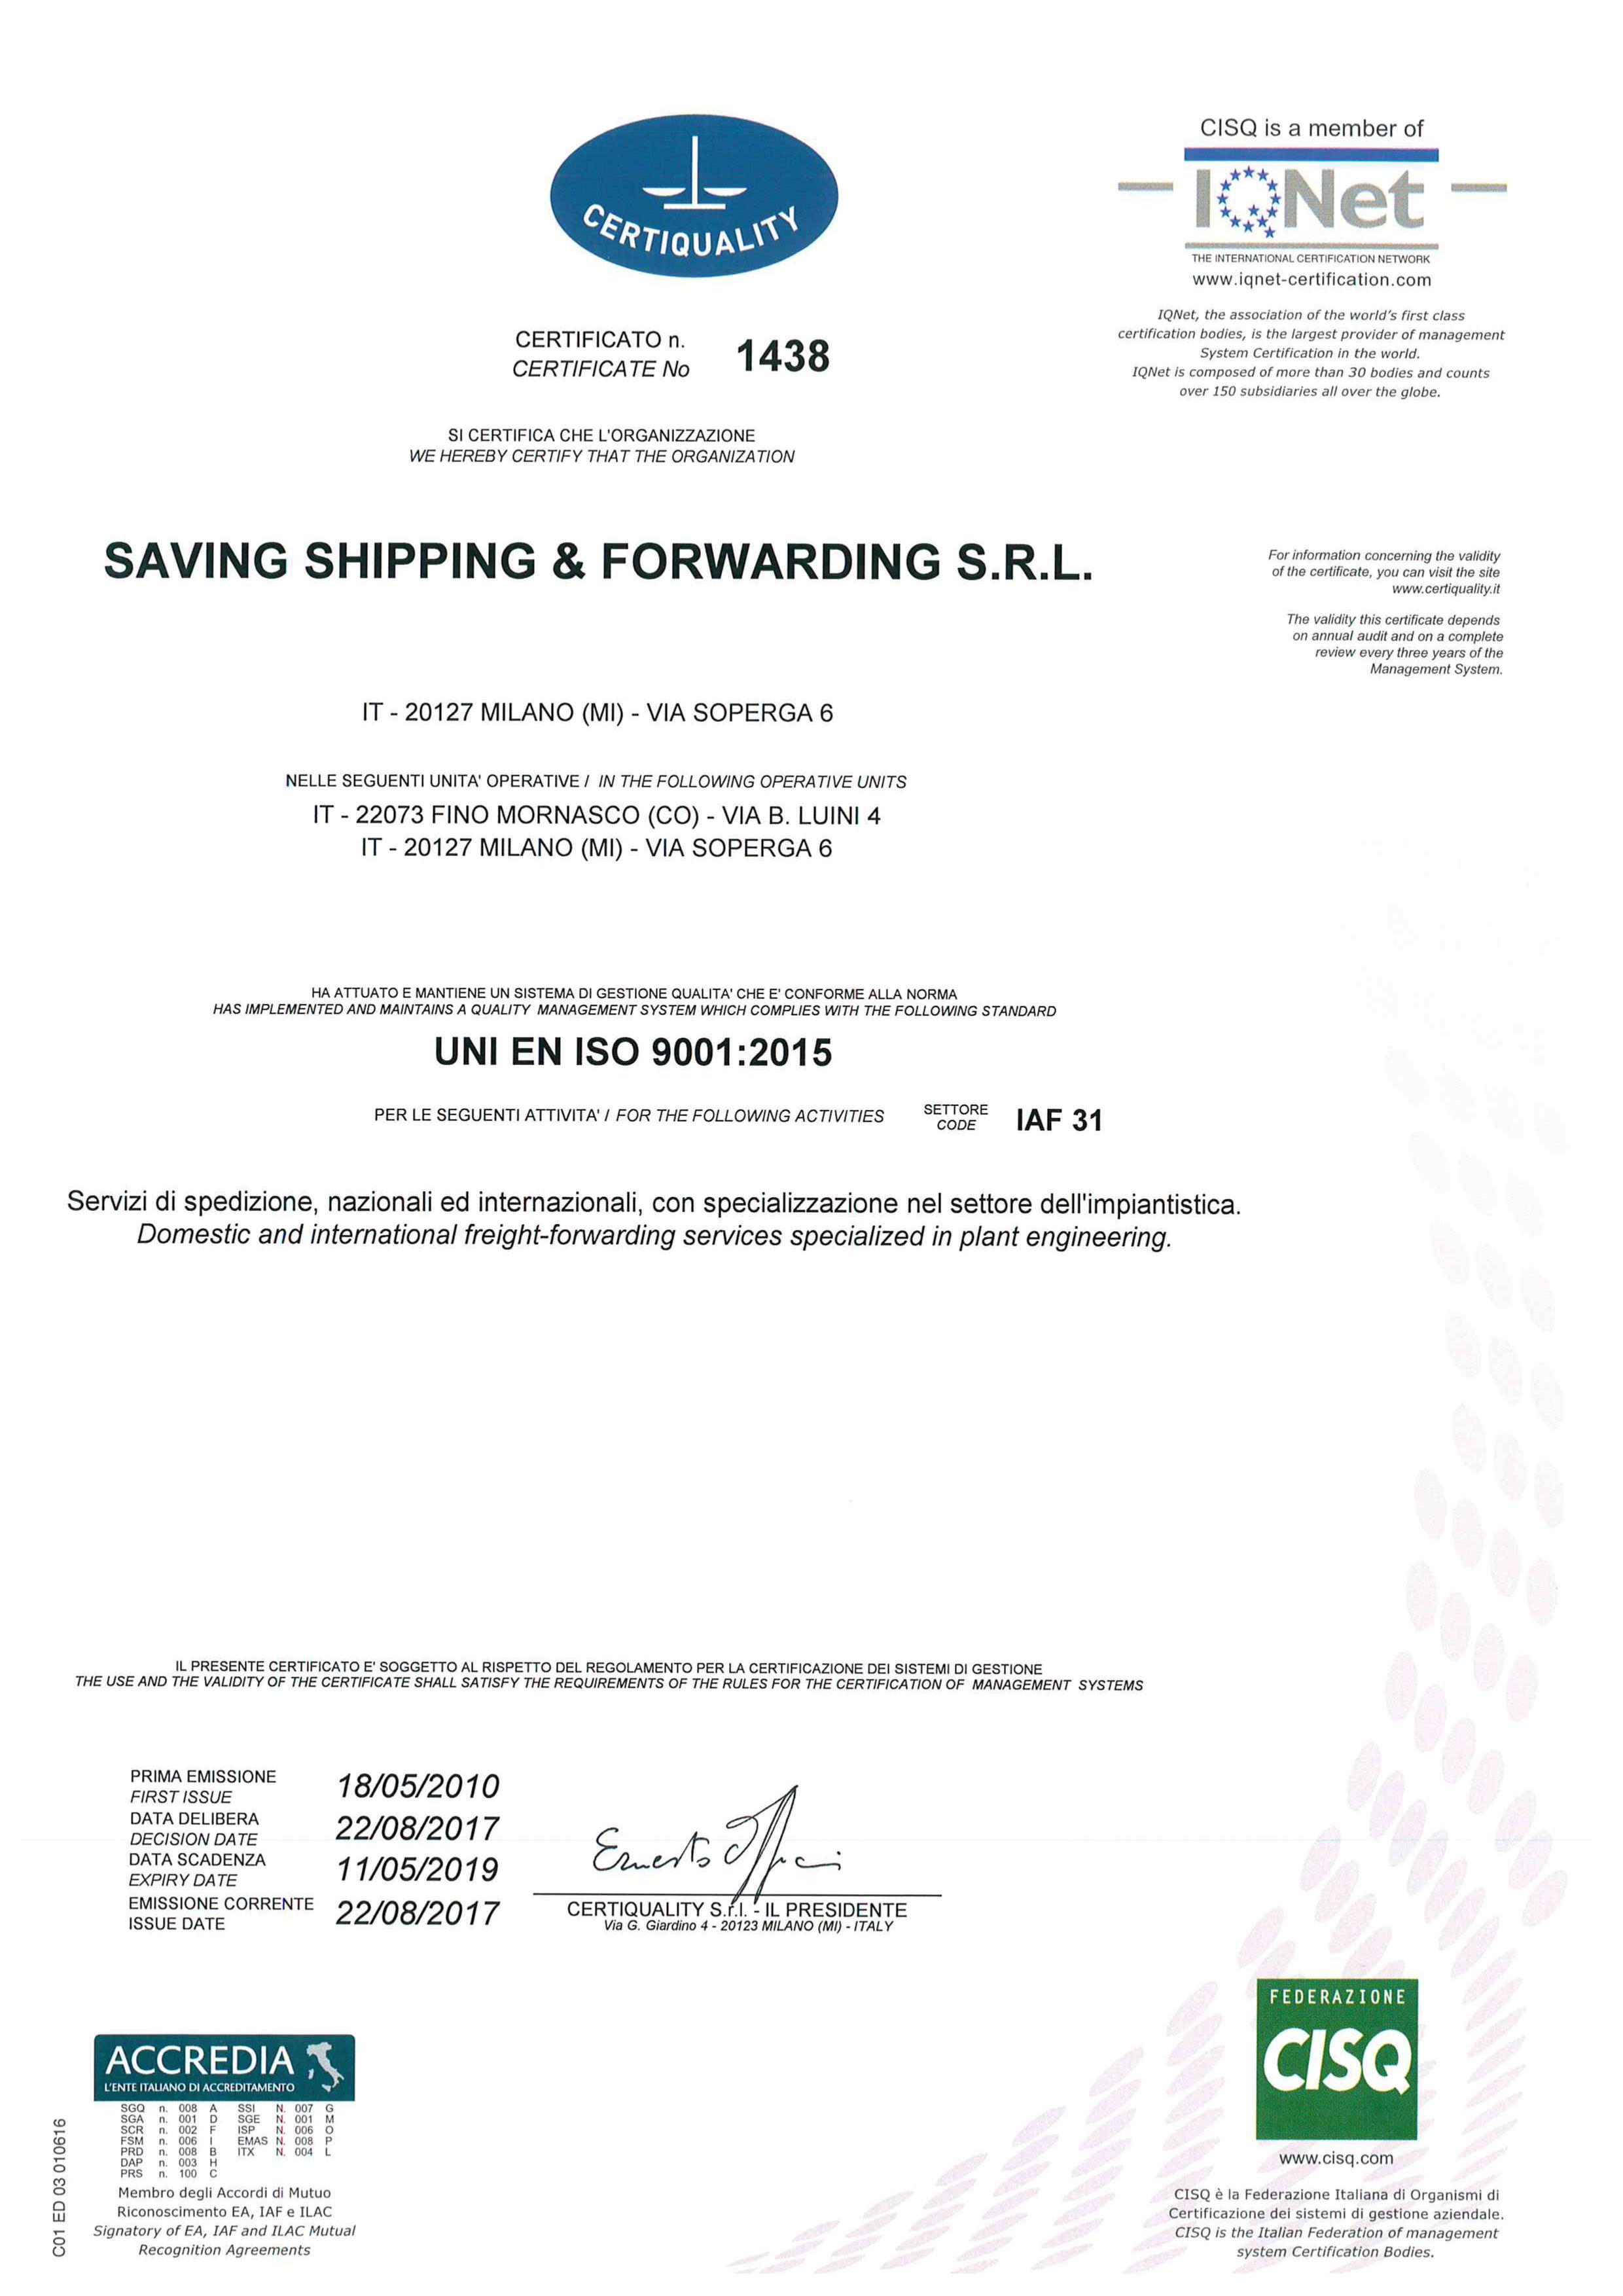 http://www.savingroup.com/images/uploads/qualita/CERTIQUALITY-SSF-2017.jpg